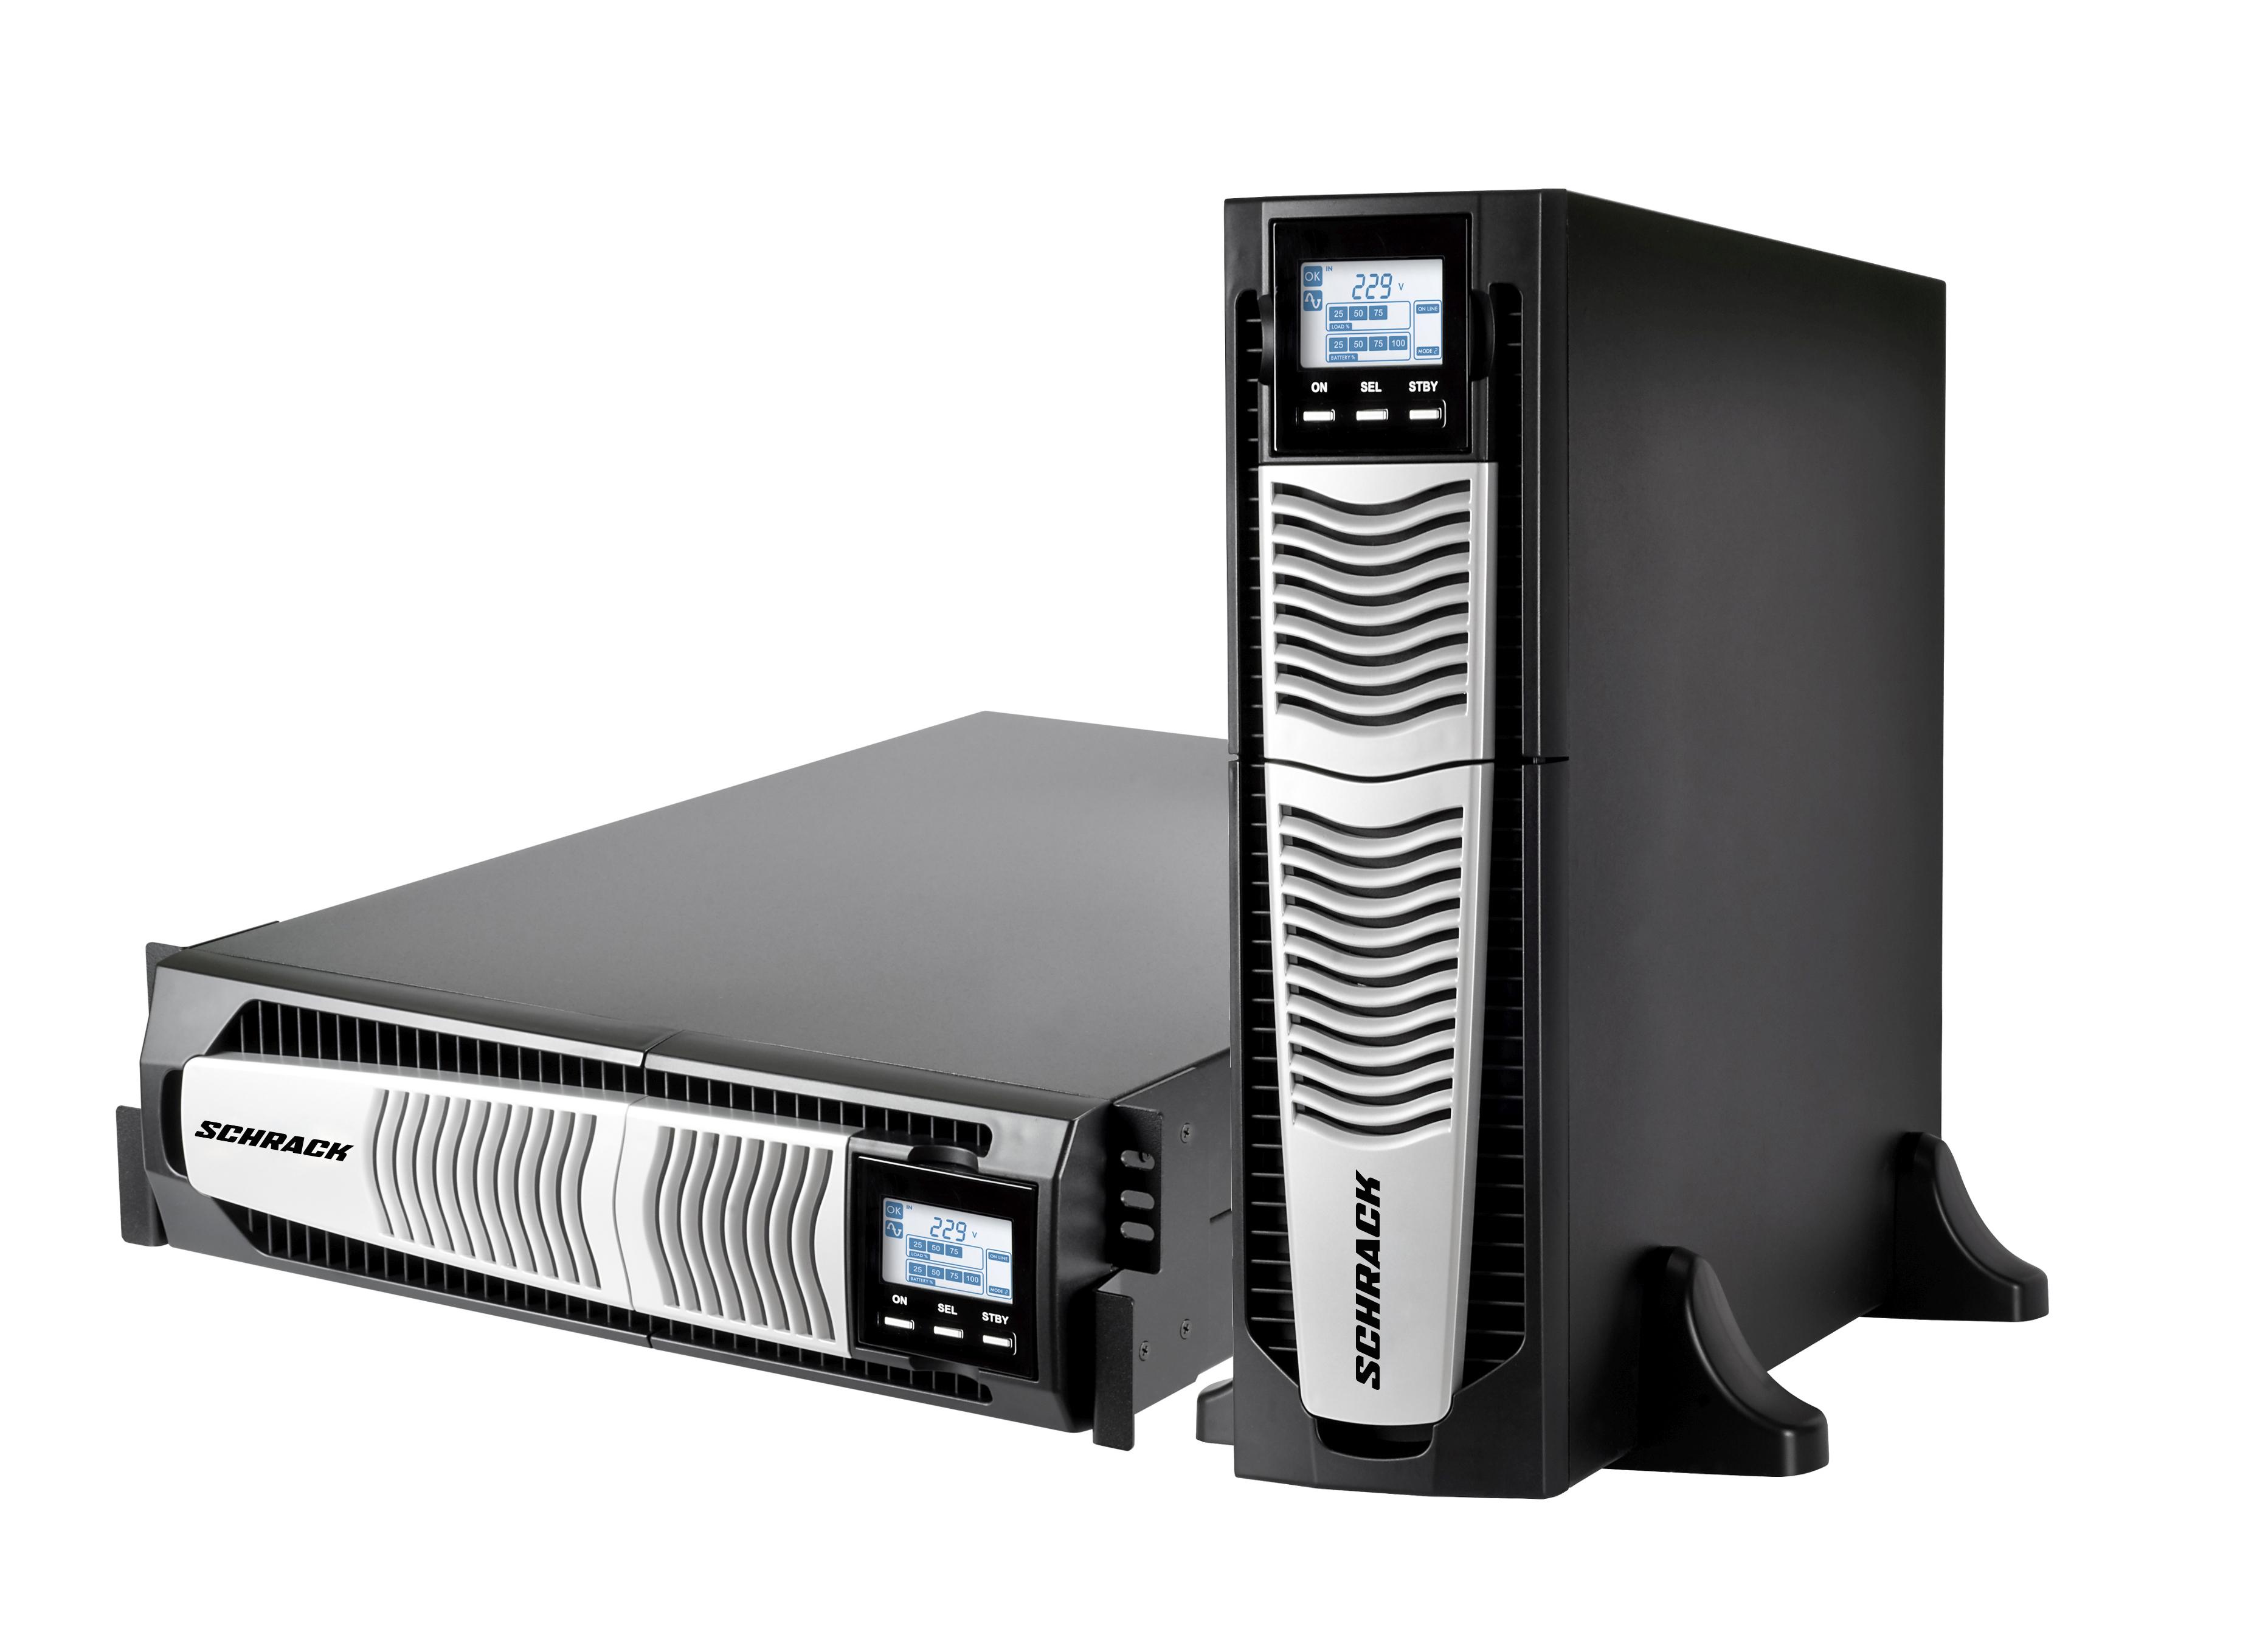 1 Stk USV GENIO Dual Power 6kVA 6kW 0Min. 1/1 phasig / Online USSD600ER-